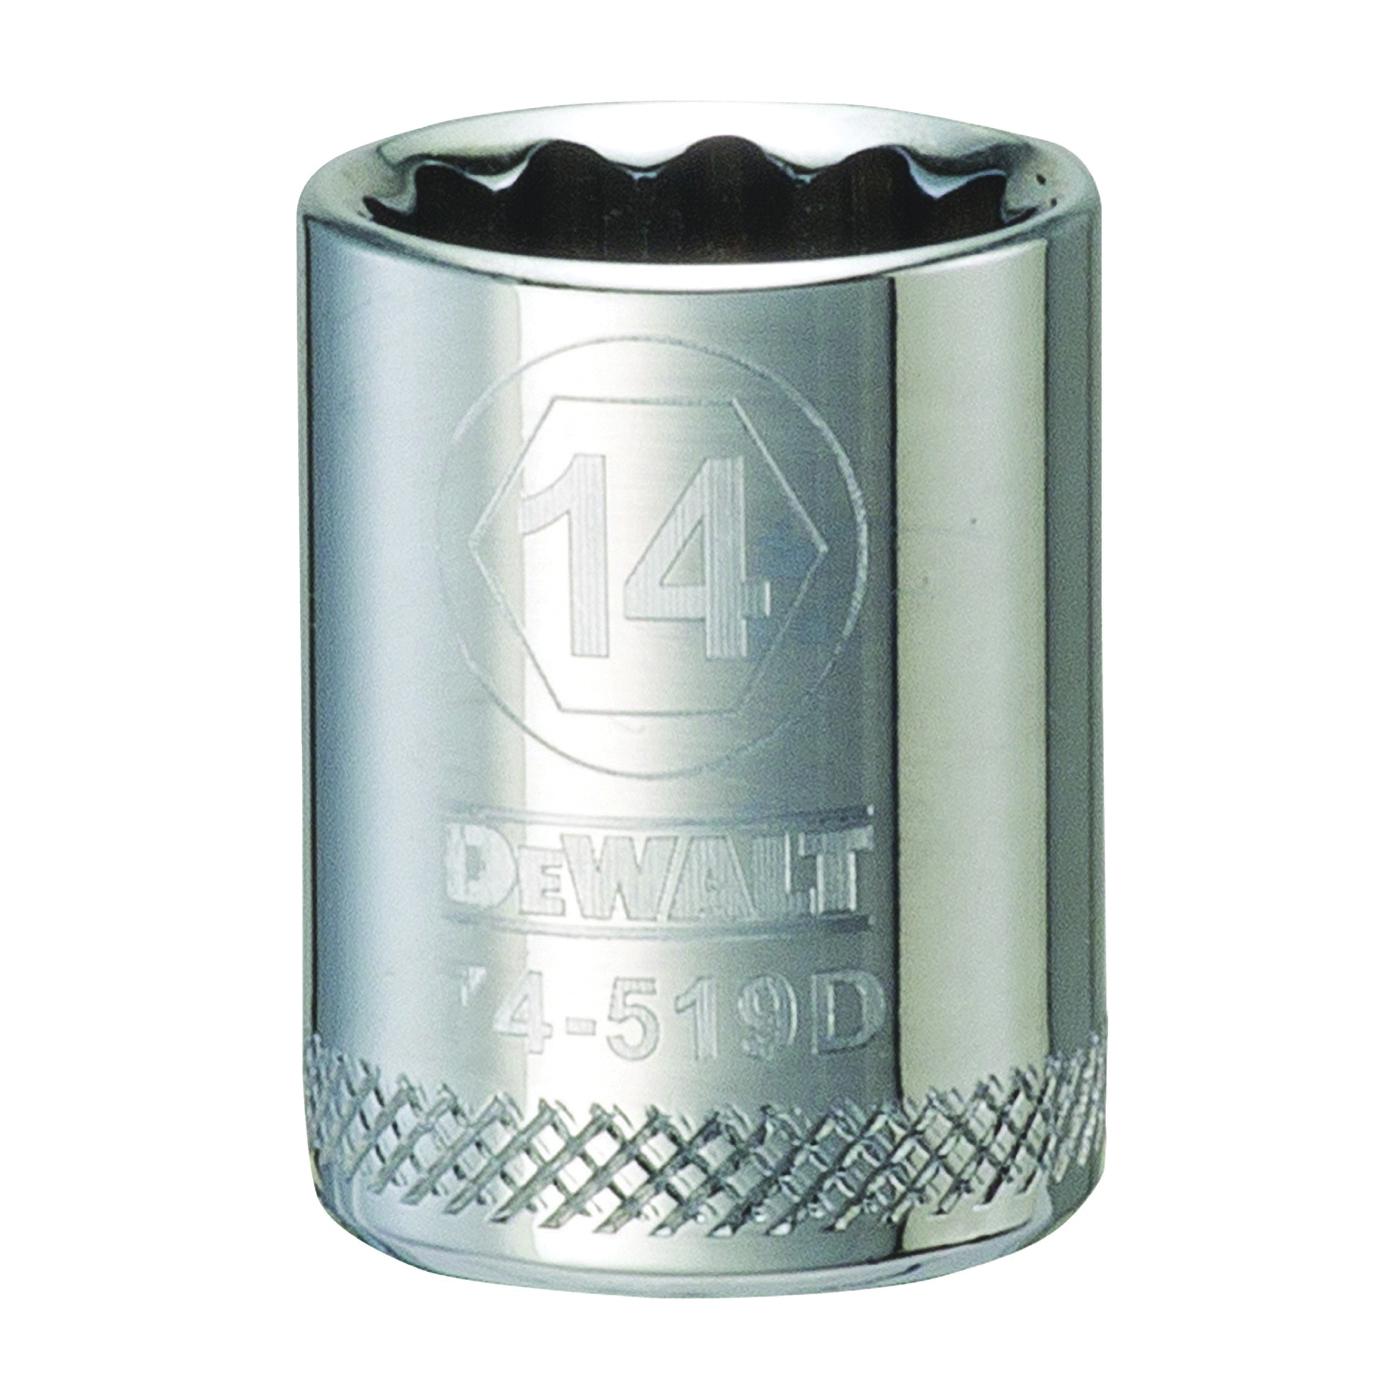 Picture of DeWALT DWMT74519OSP Hand Socket, 14 mm Socket, 3/8 in Drive, 12 -Point, Vanadium Steel, Polished Chrome